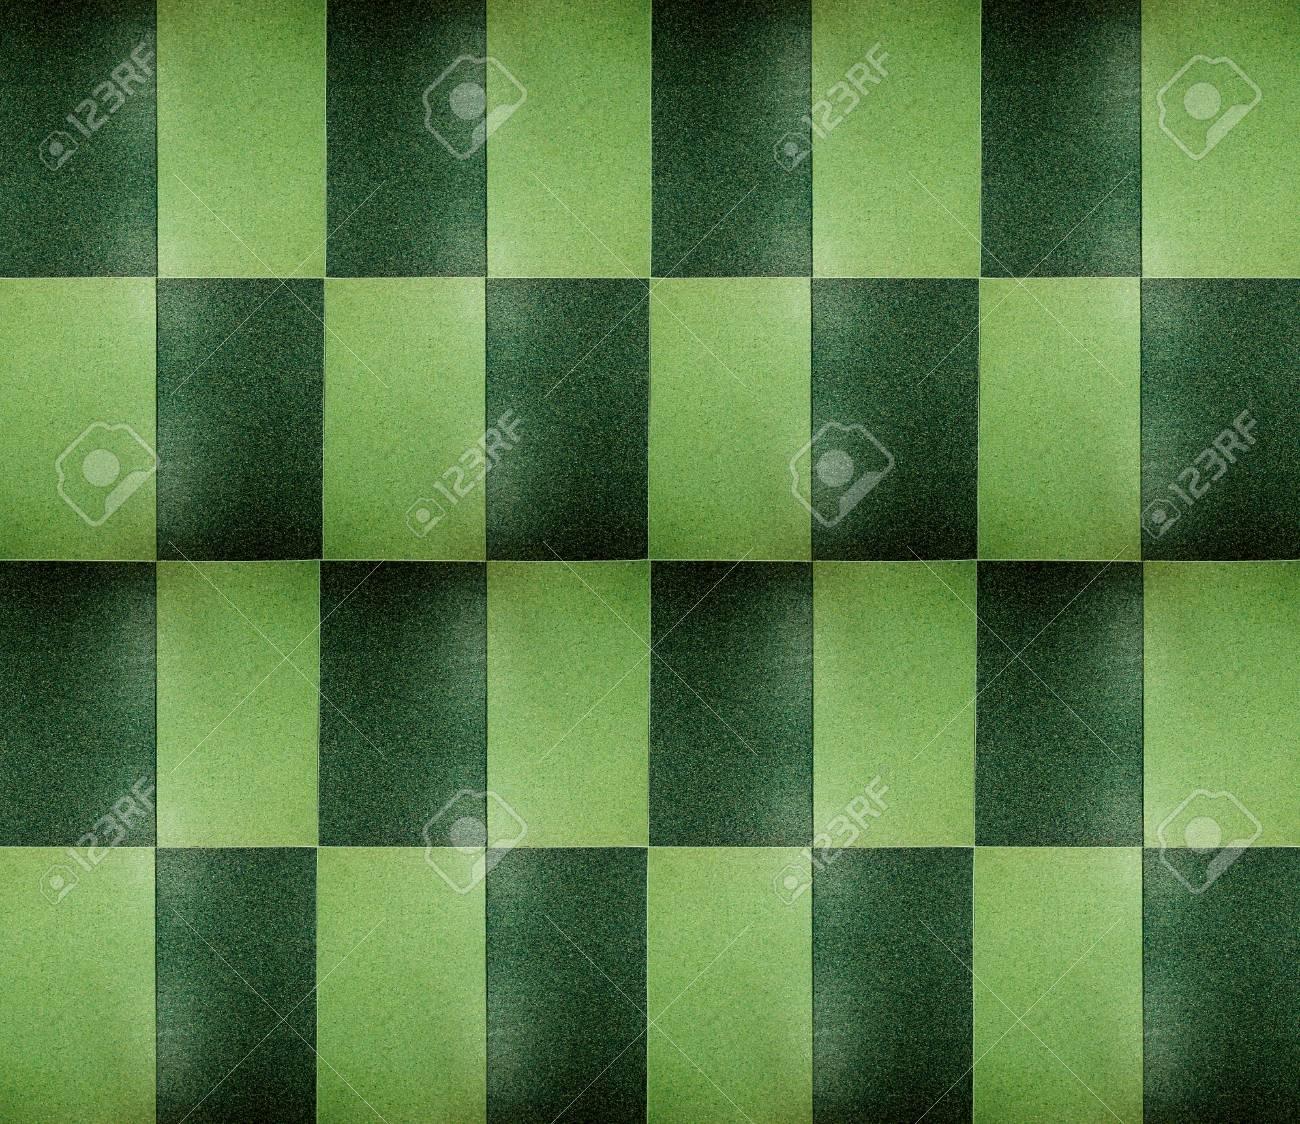 The Seamless pattern pebble floor background Stock Photo - 14404391